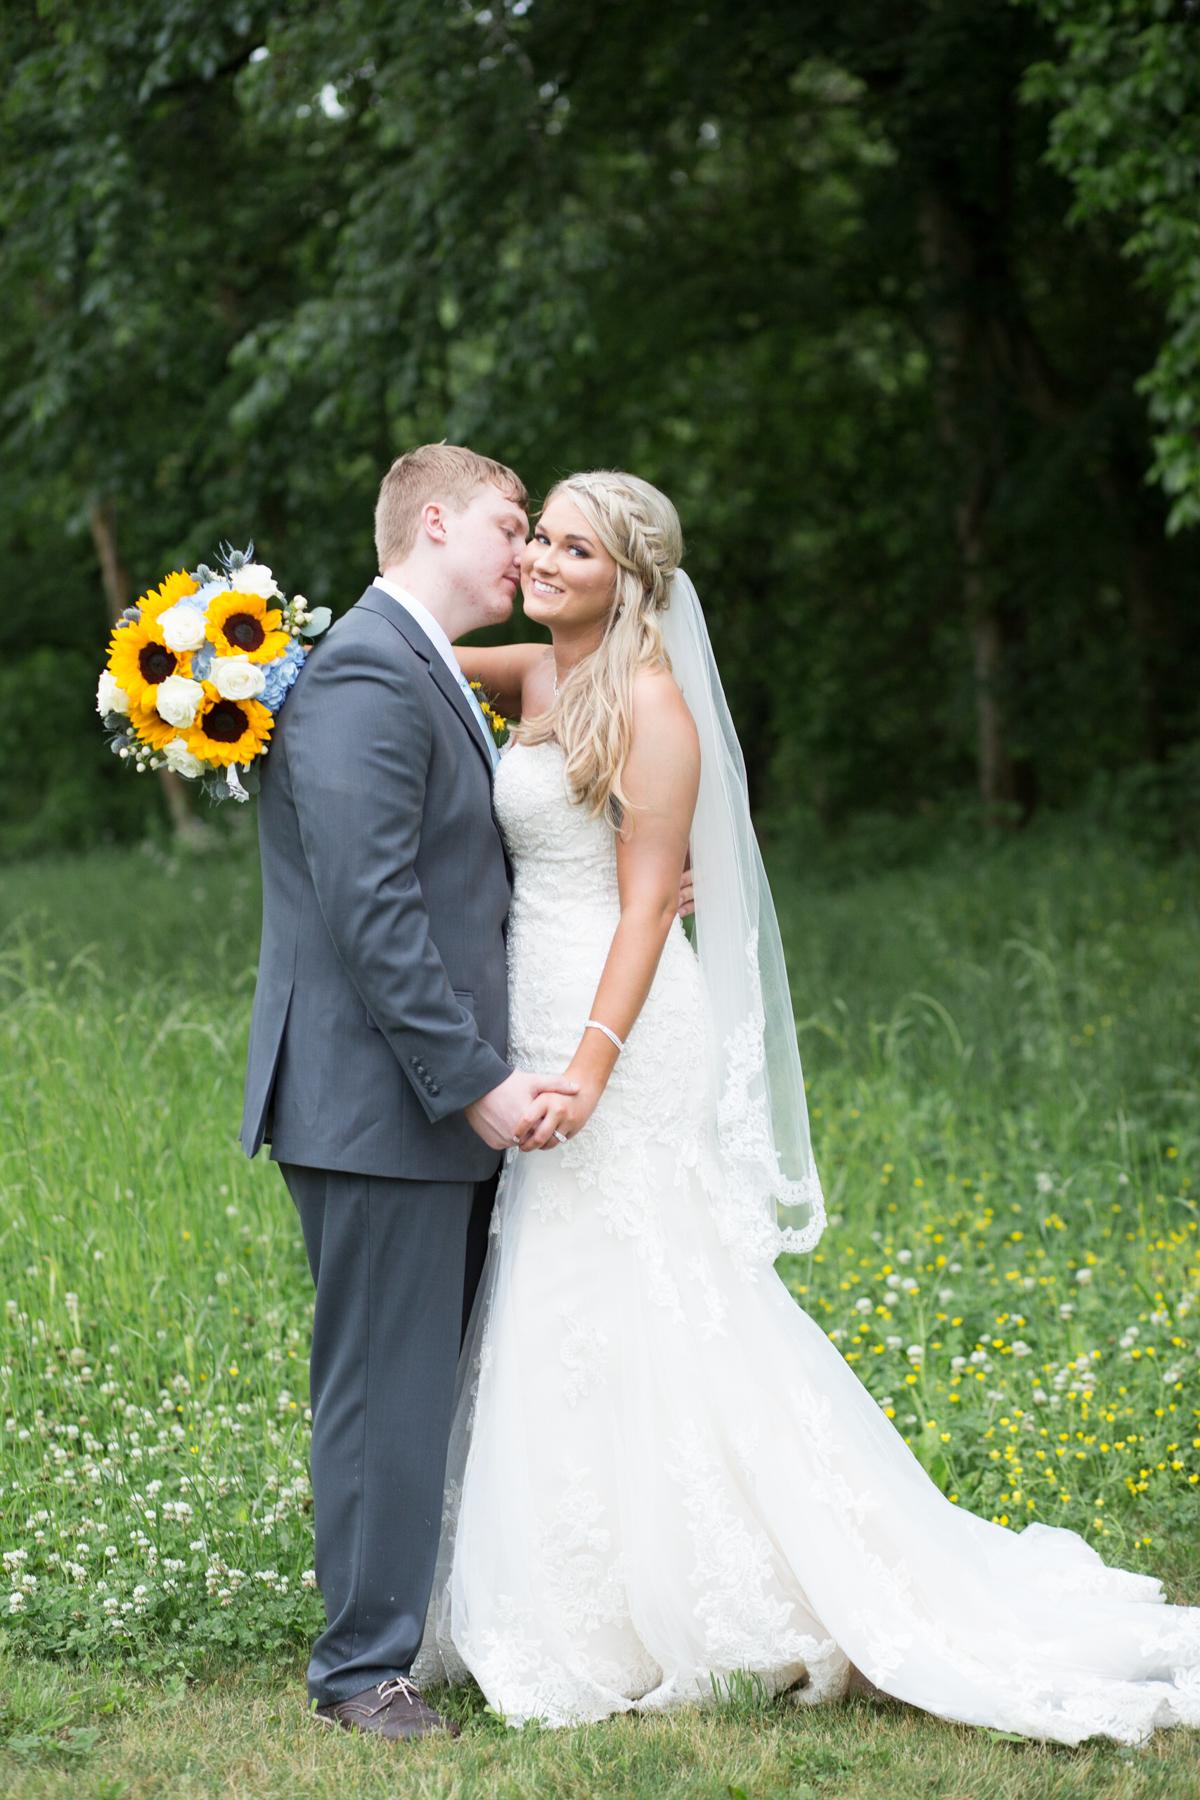 The-venue-at-white-oak-farms-wedding-nashville-wedding-photographers-0277.jpg